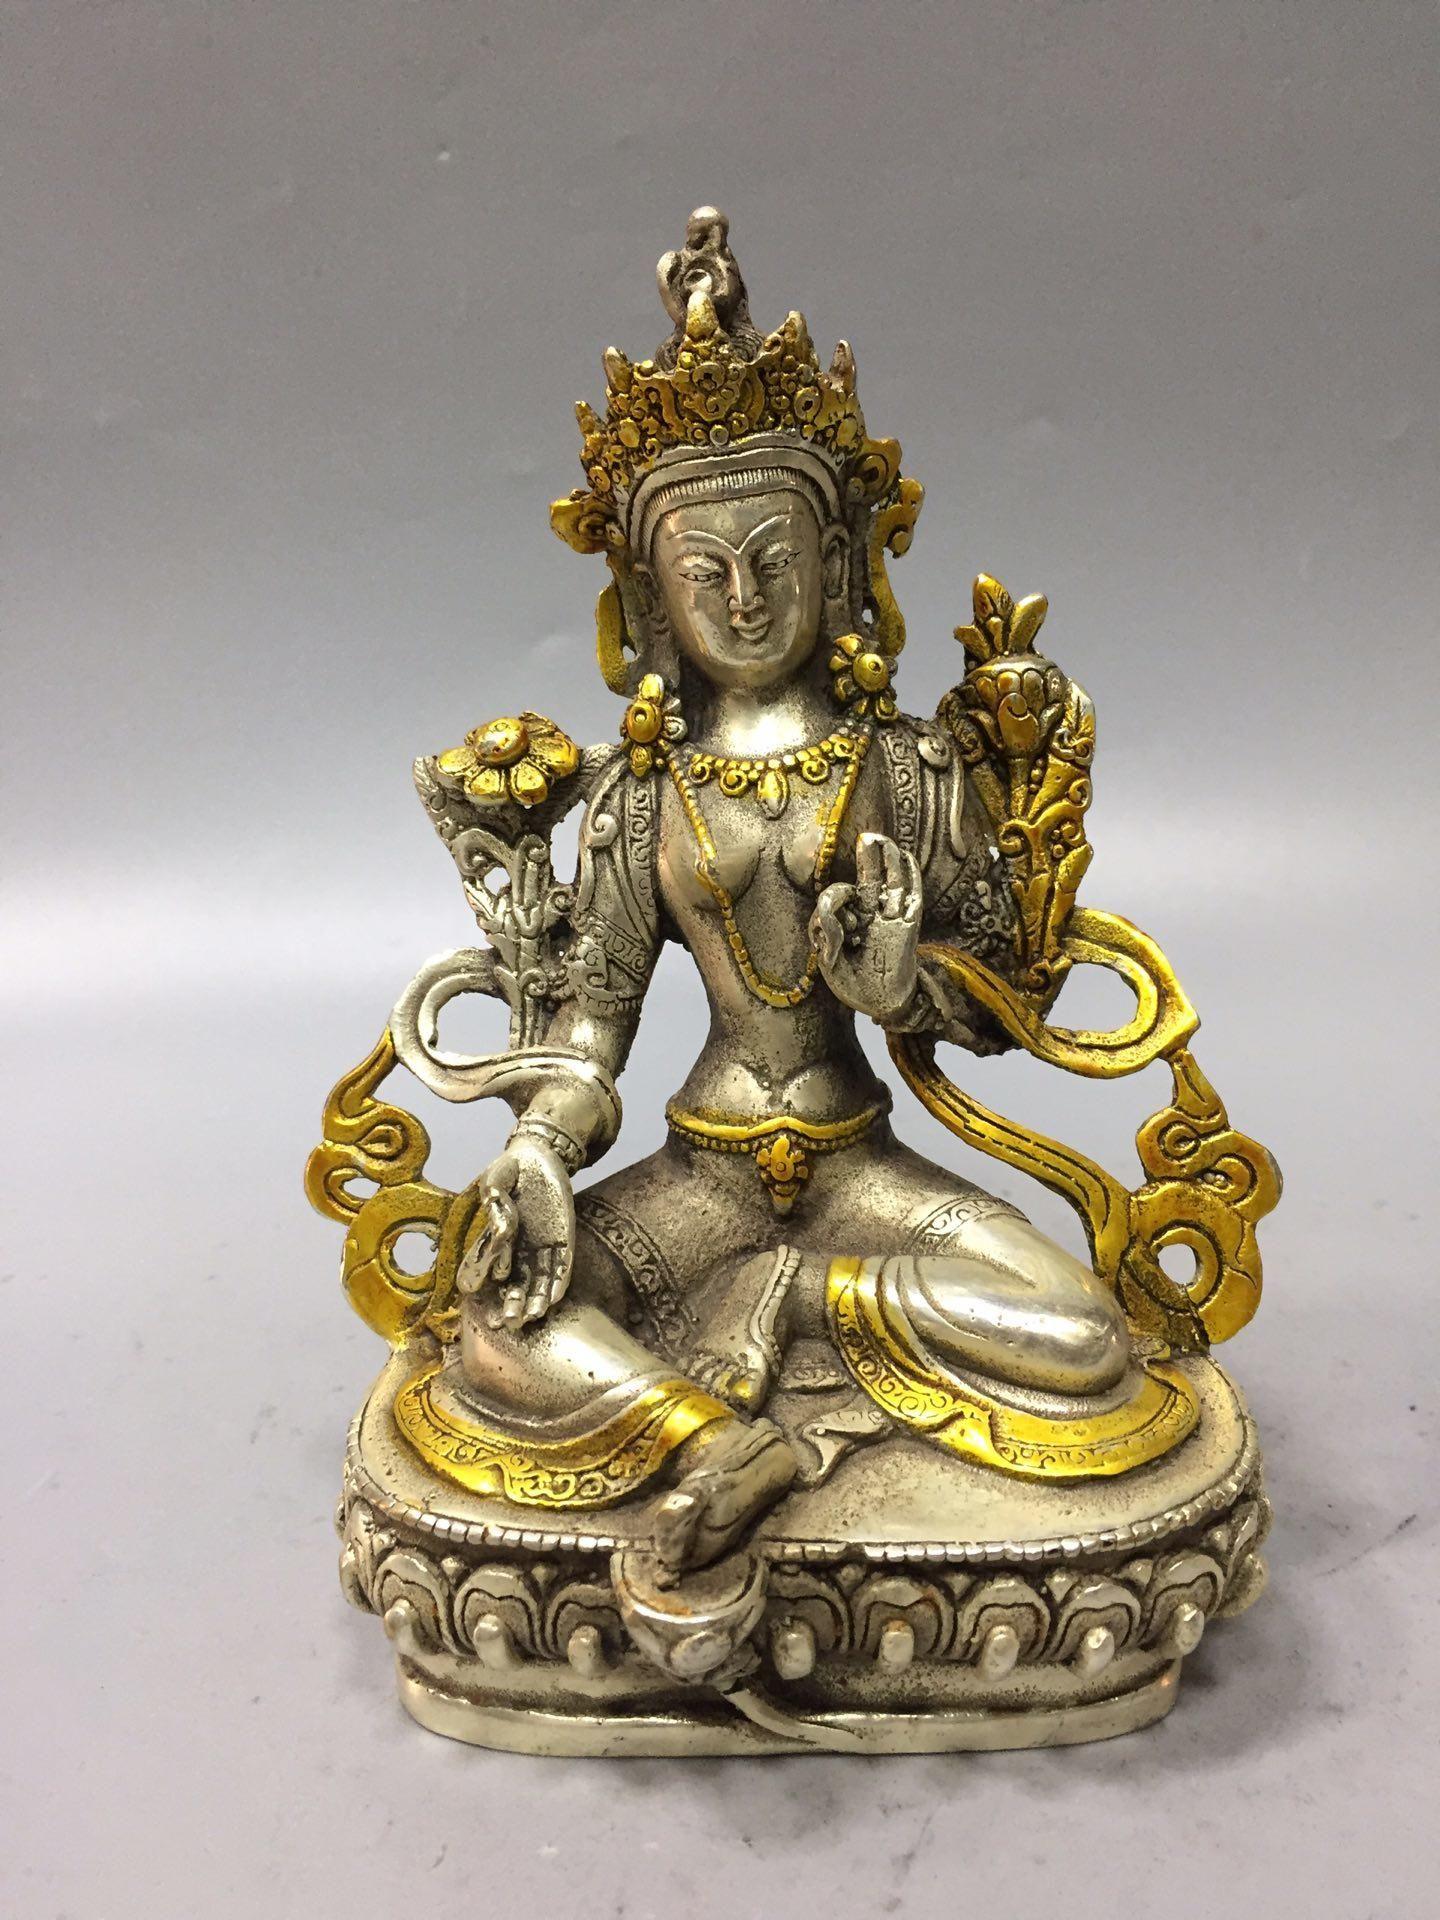 Rara china antigua tibetana de plata tallada a mano estatua del Buda de Tara